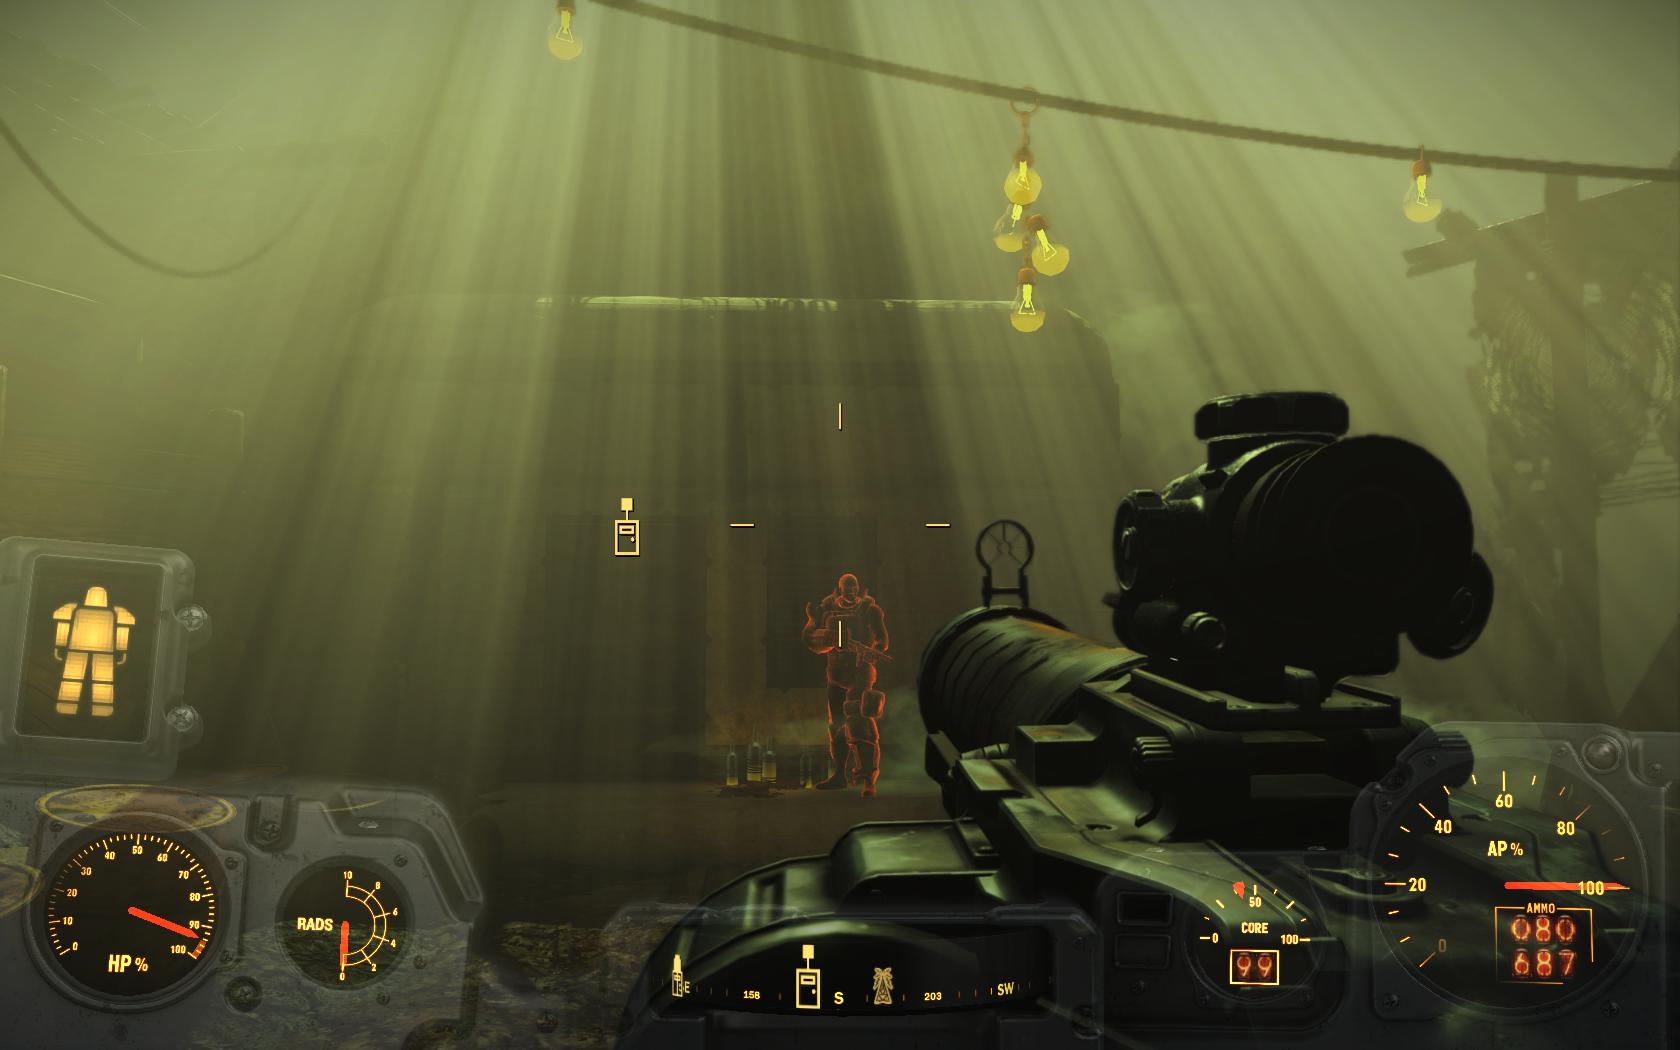 Унылый полдень (Фар-Харбор, у входа в Ядро) - Fallout 4 Ядро